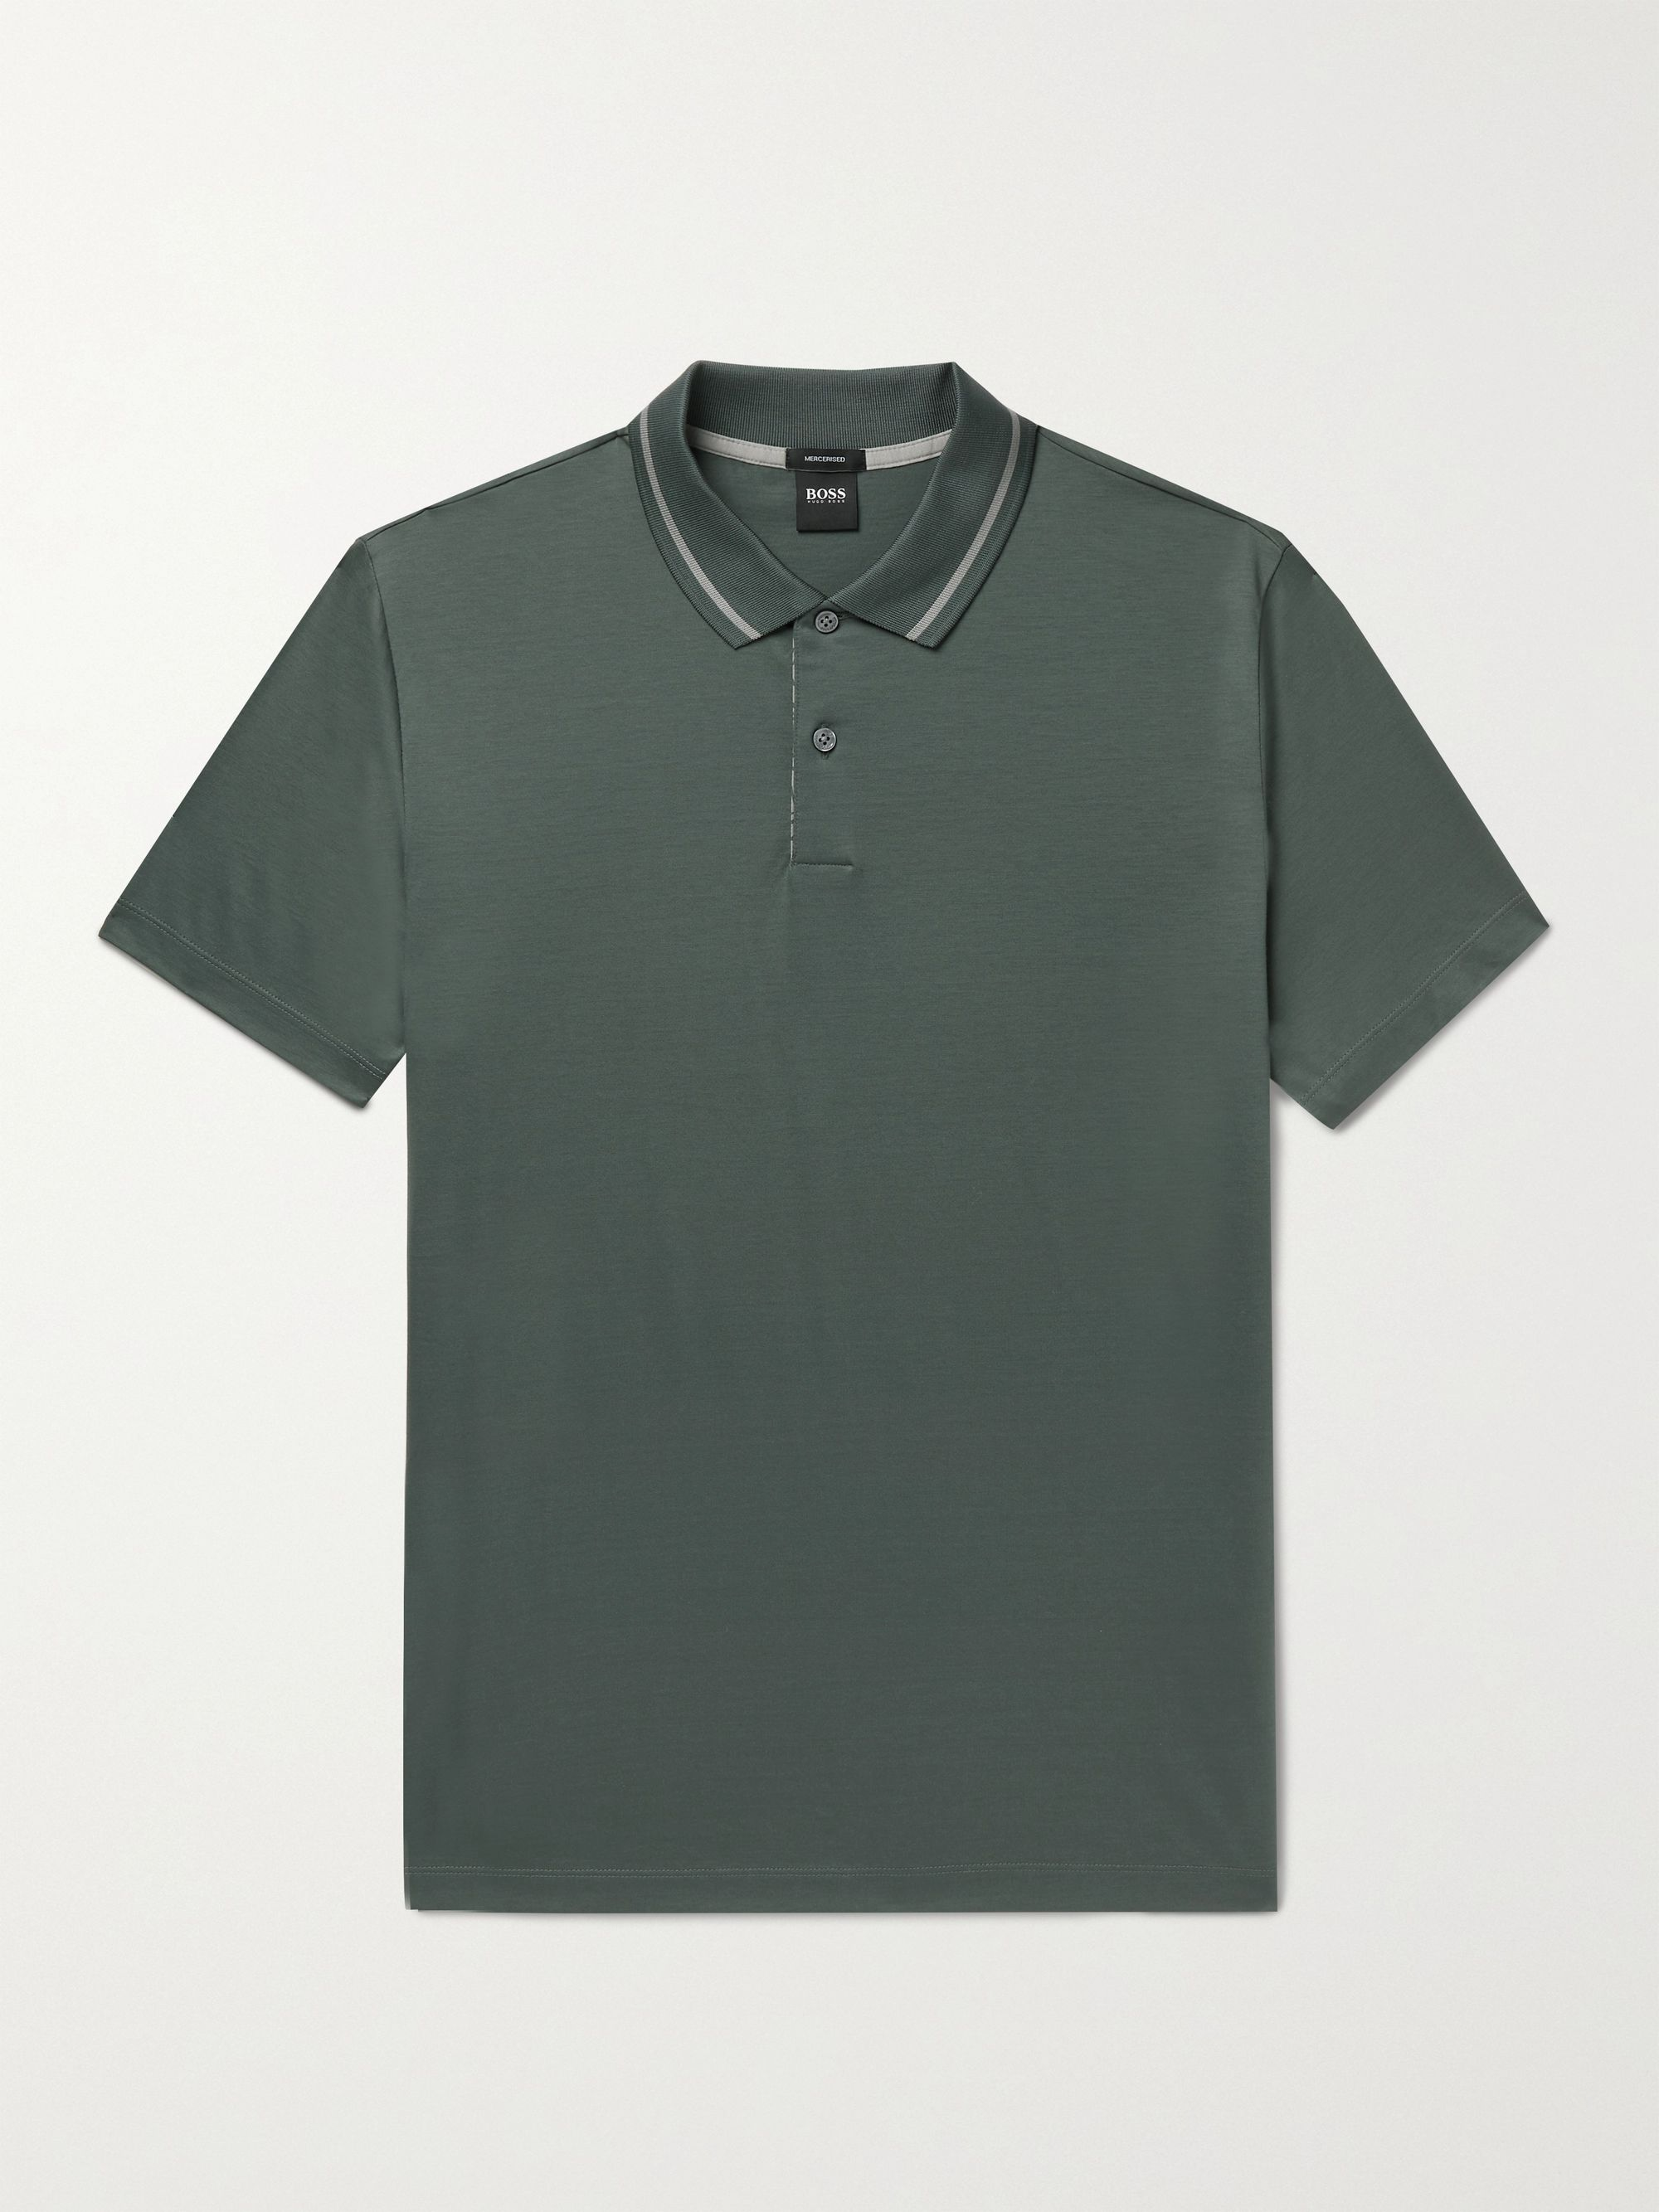 HUGO BOSS Mercerised Cotton Polo Shirt